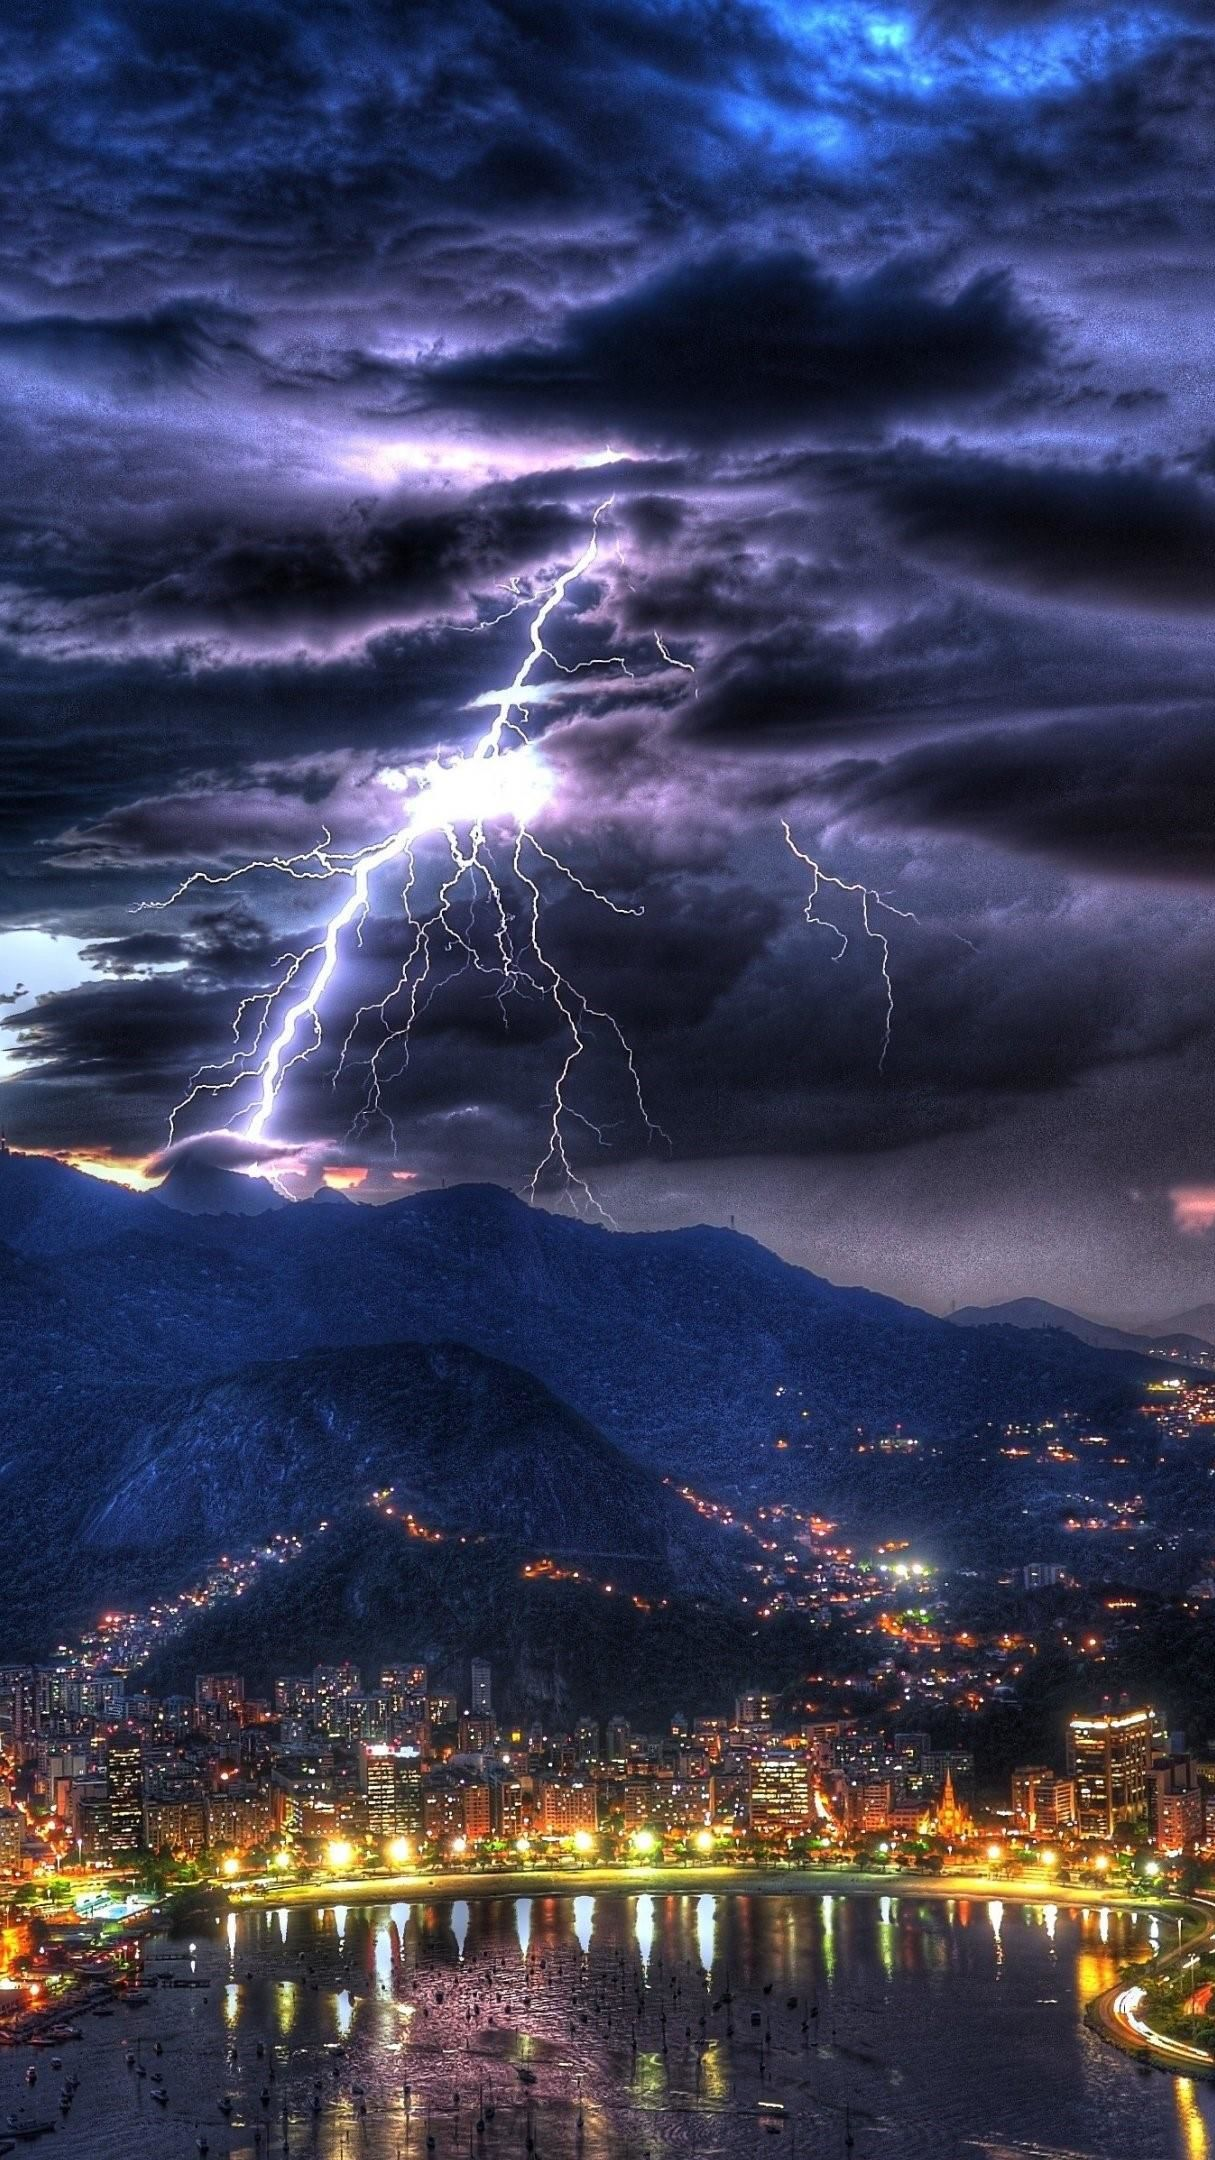 Lightning above rio de janeiro 4k ultrahd wallpaper backiee free ultra hd wallpaper platform - Lightning wallpaper 4k ...